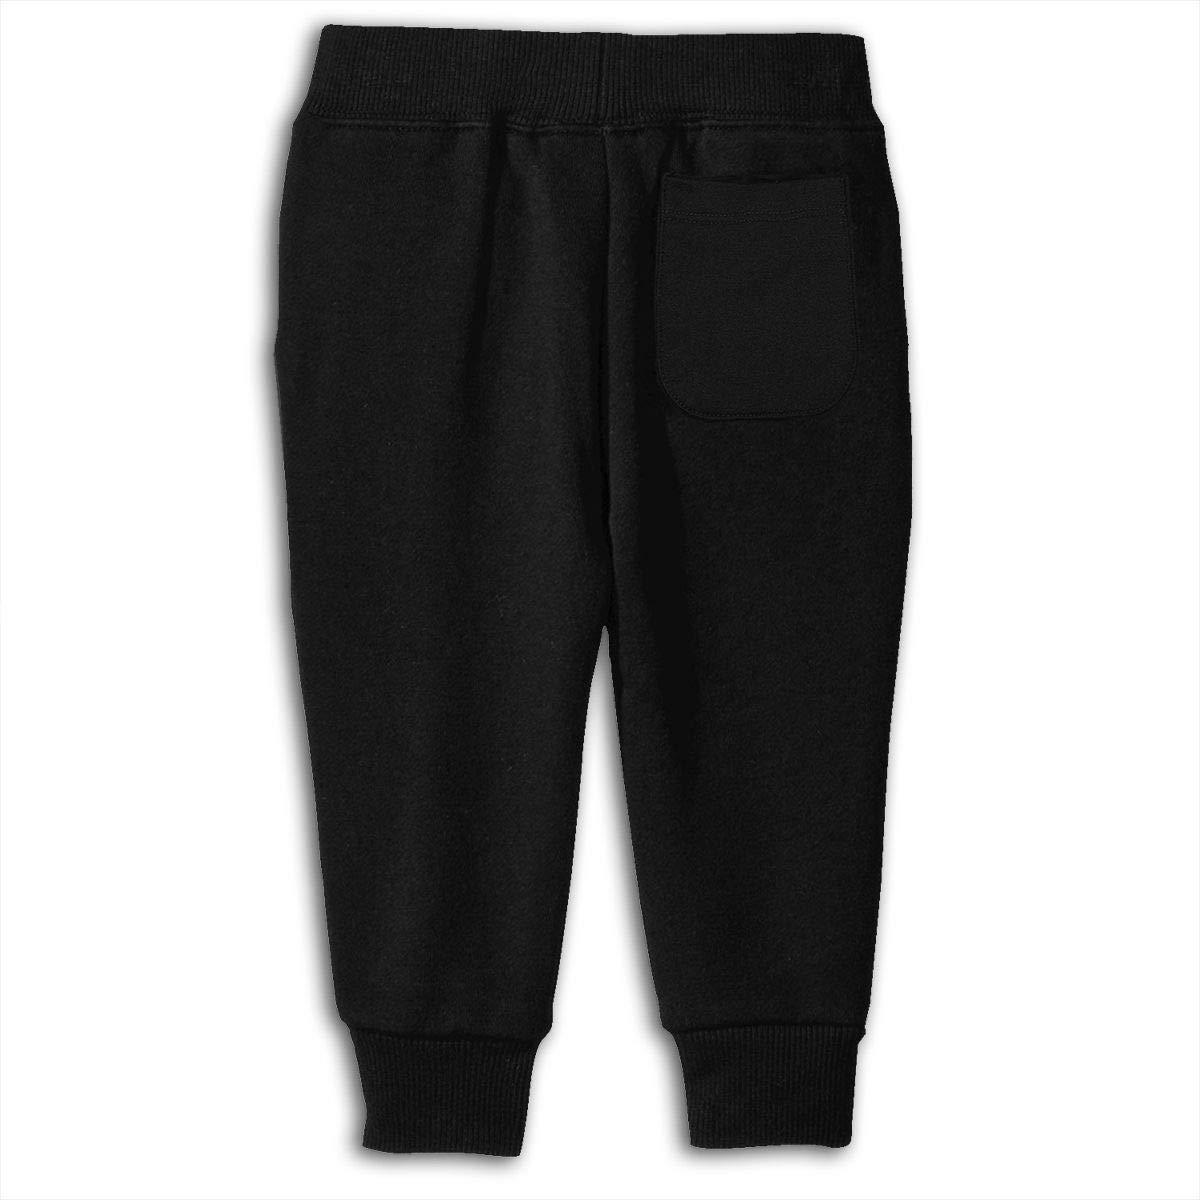 ShineFun Printed Rowing Retro Childrens Boys /& Girls Unisex Cool Sweatpants